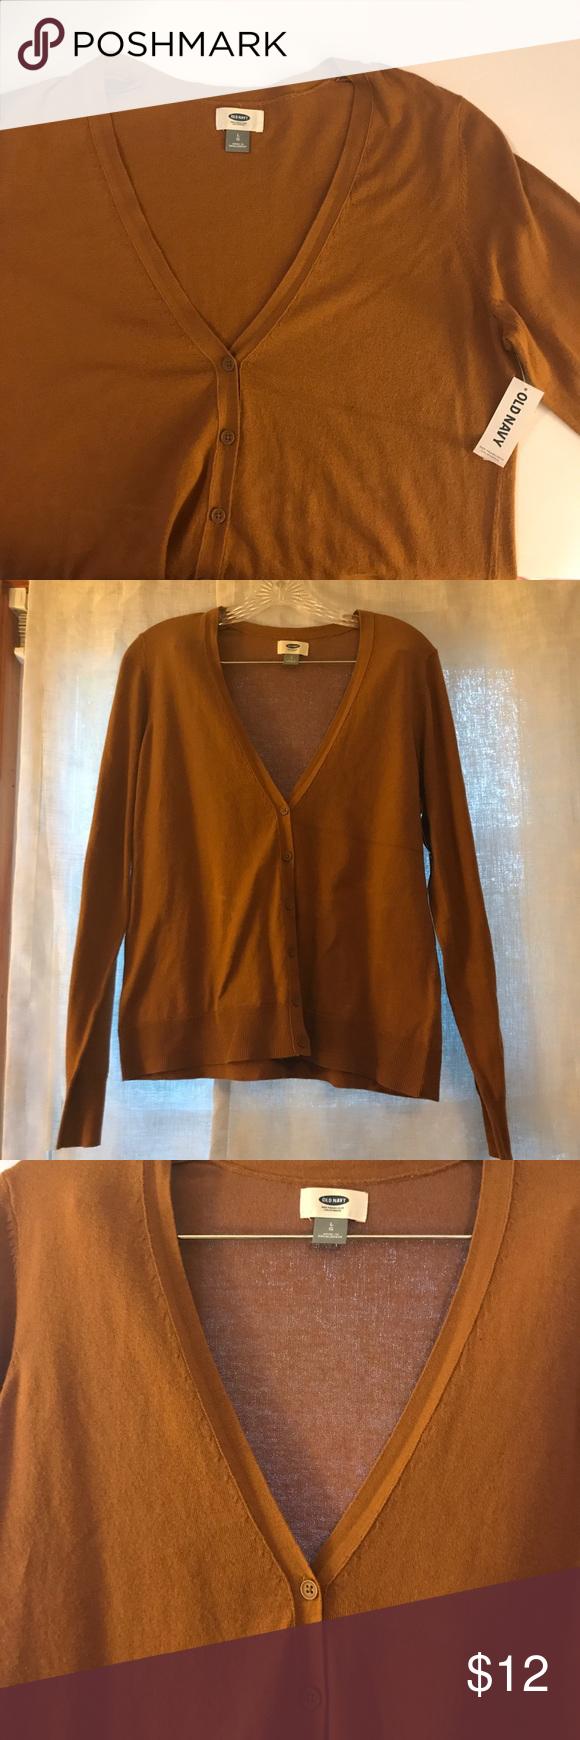 Tan / brown button down lightweight cardigan Dark tan / light ...